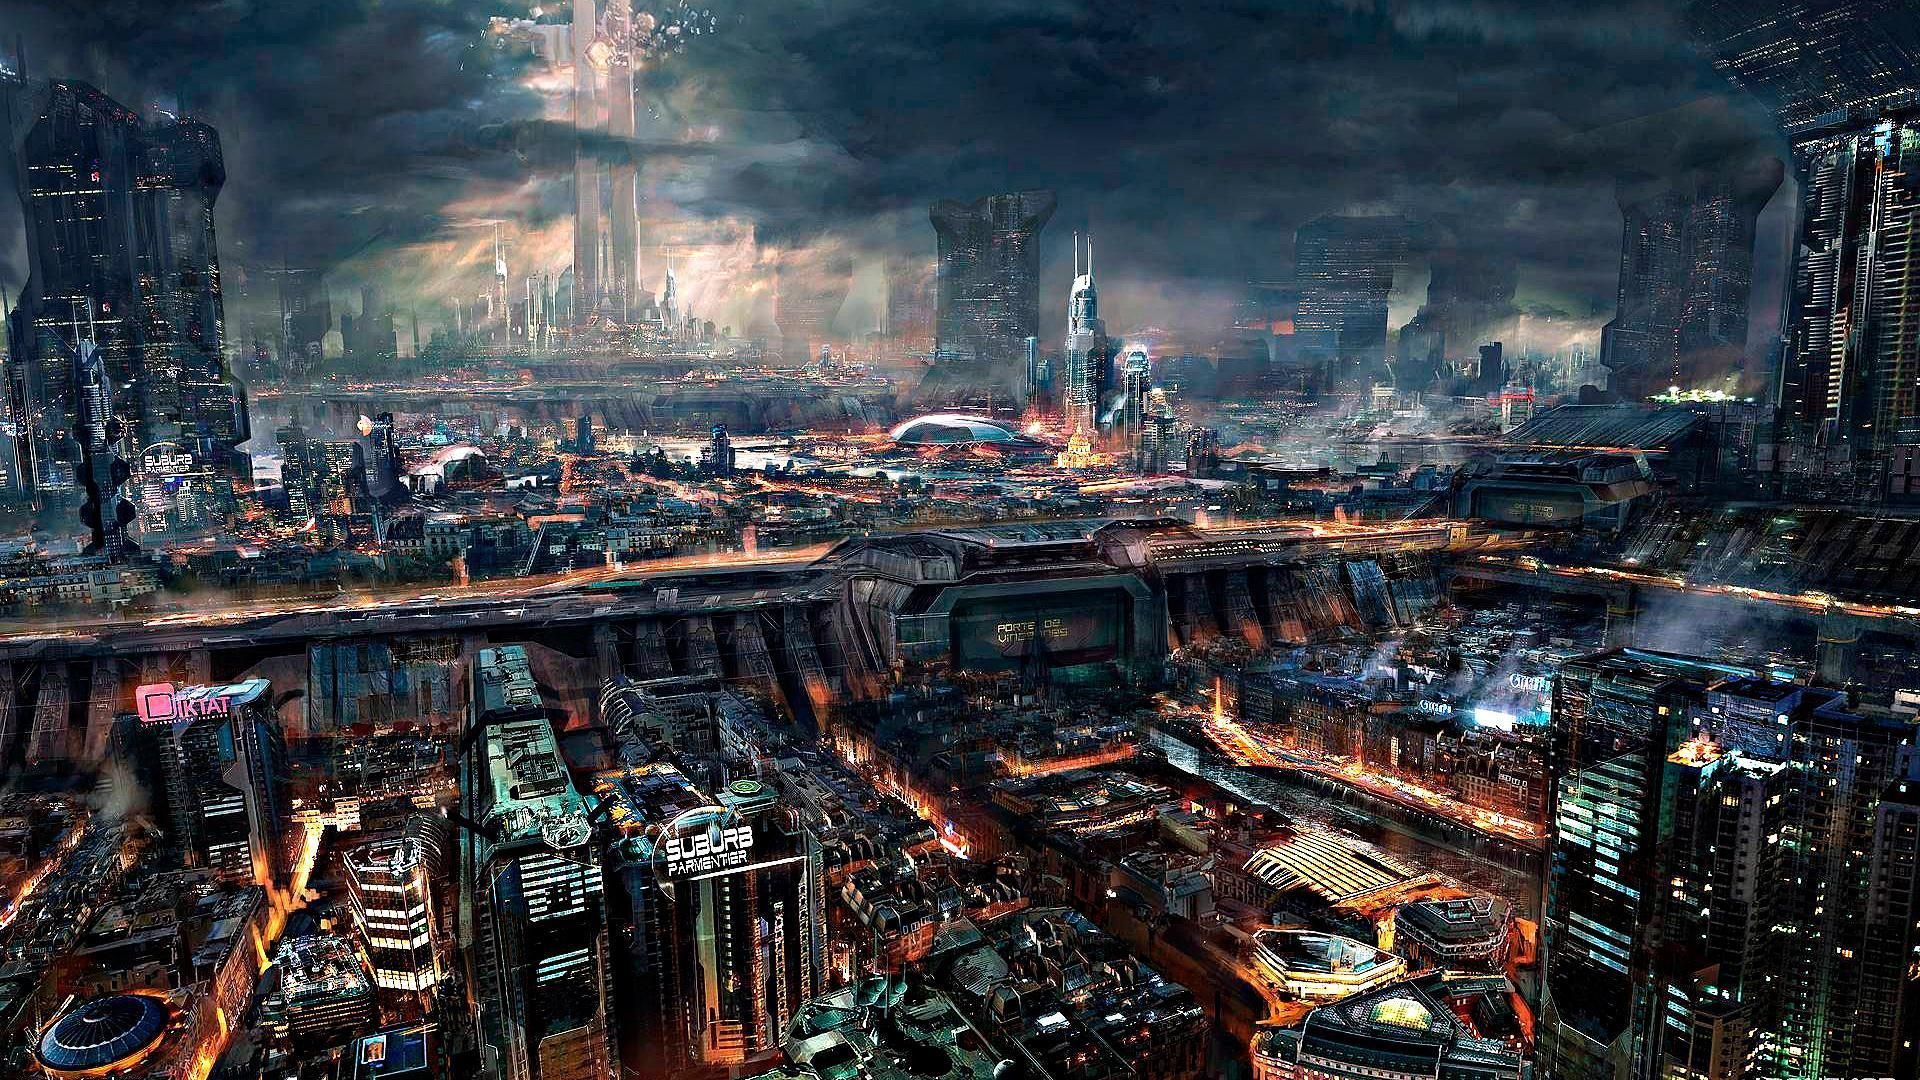 City View Hd 202 Meno Istorija